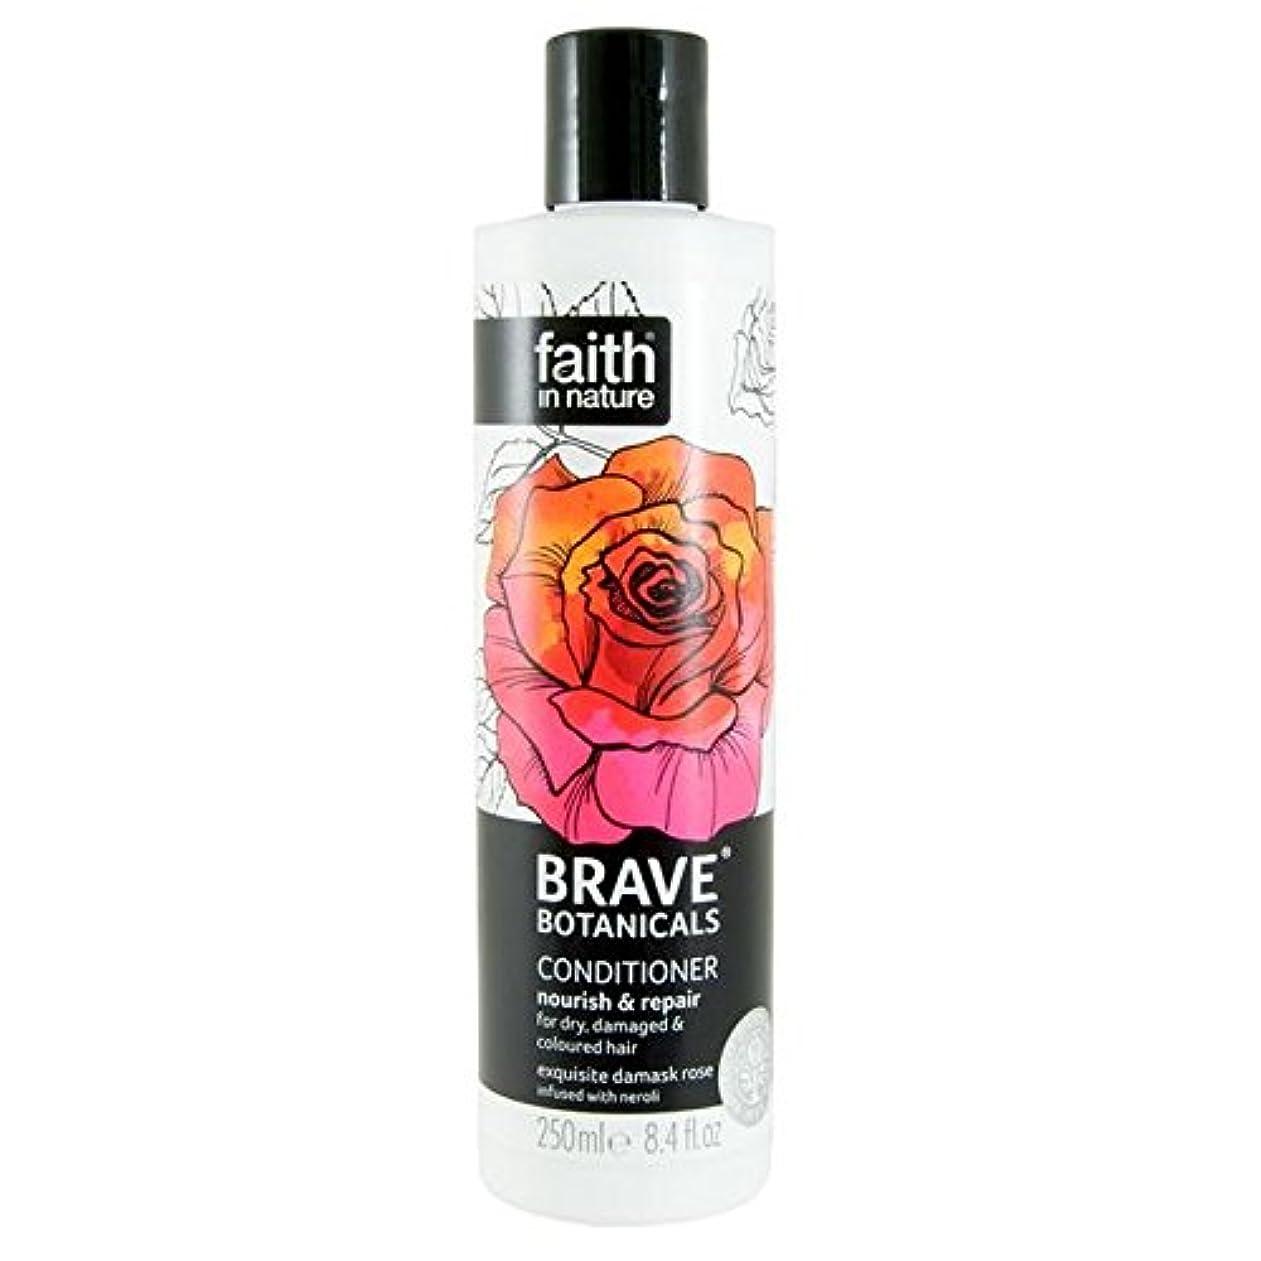 Brave Botanicals Rose & Neroli Nourish & Repair Conditioner 250ml (Pack of 4) - (Faith In Nature) 勇敢な植物は、ローズ&ネロリ...